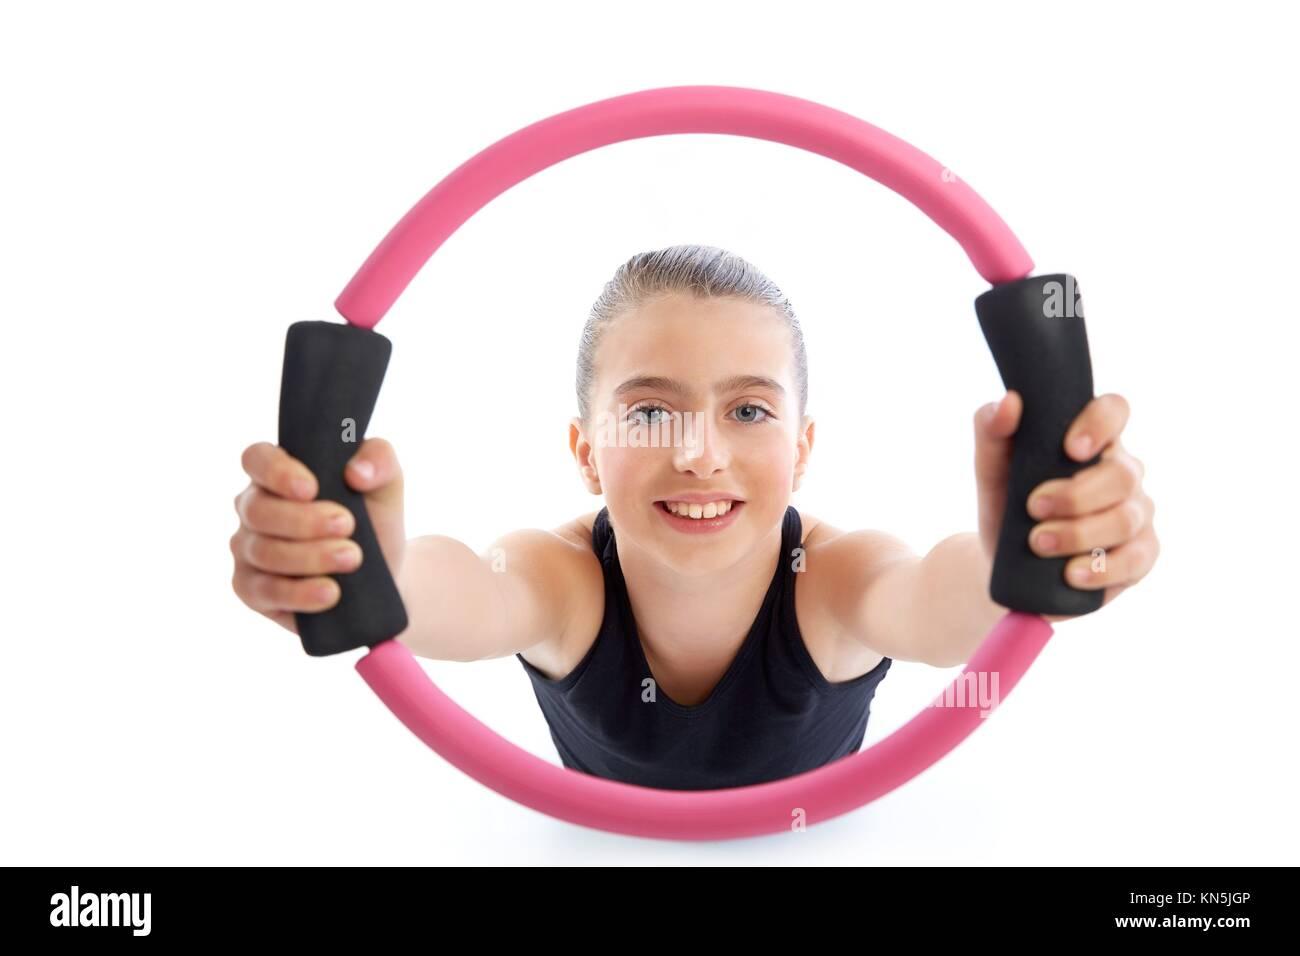 Fitness Pilates Yoga Ring Kid Girl Exercise Workout On White Stock Photo 167925430 Alamy